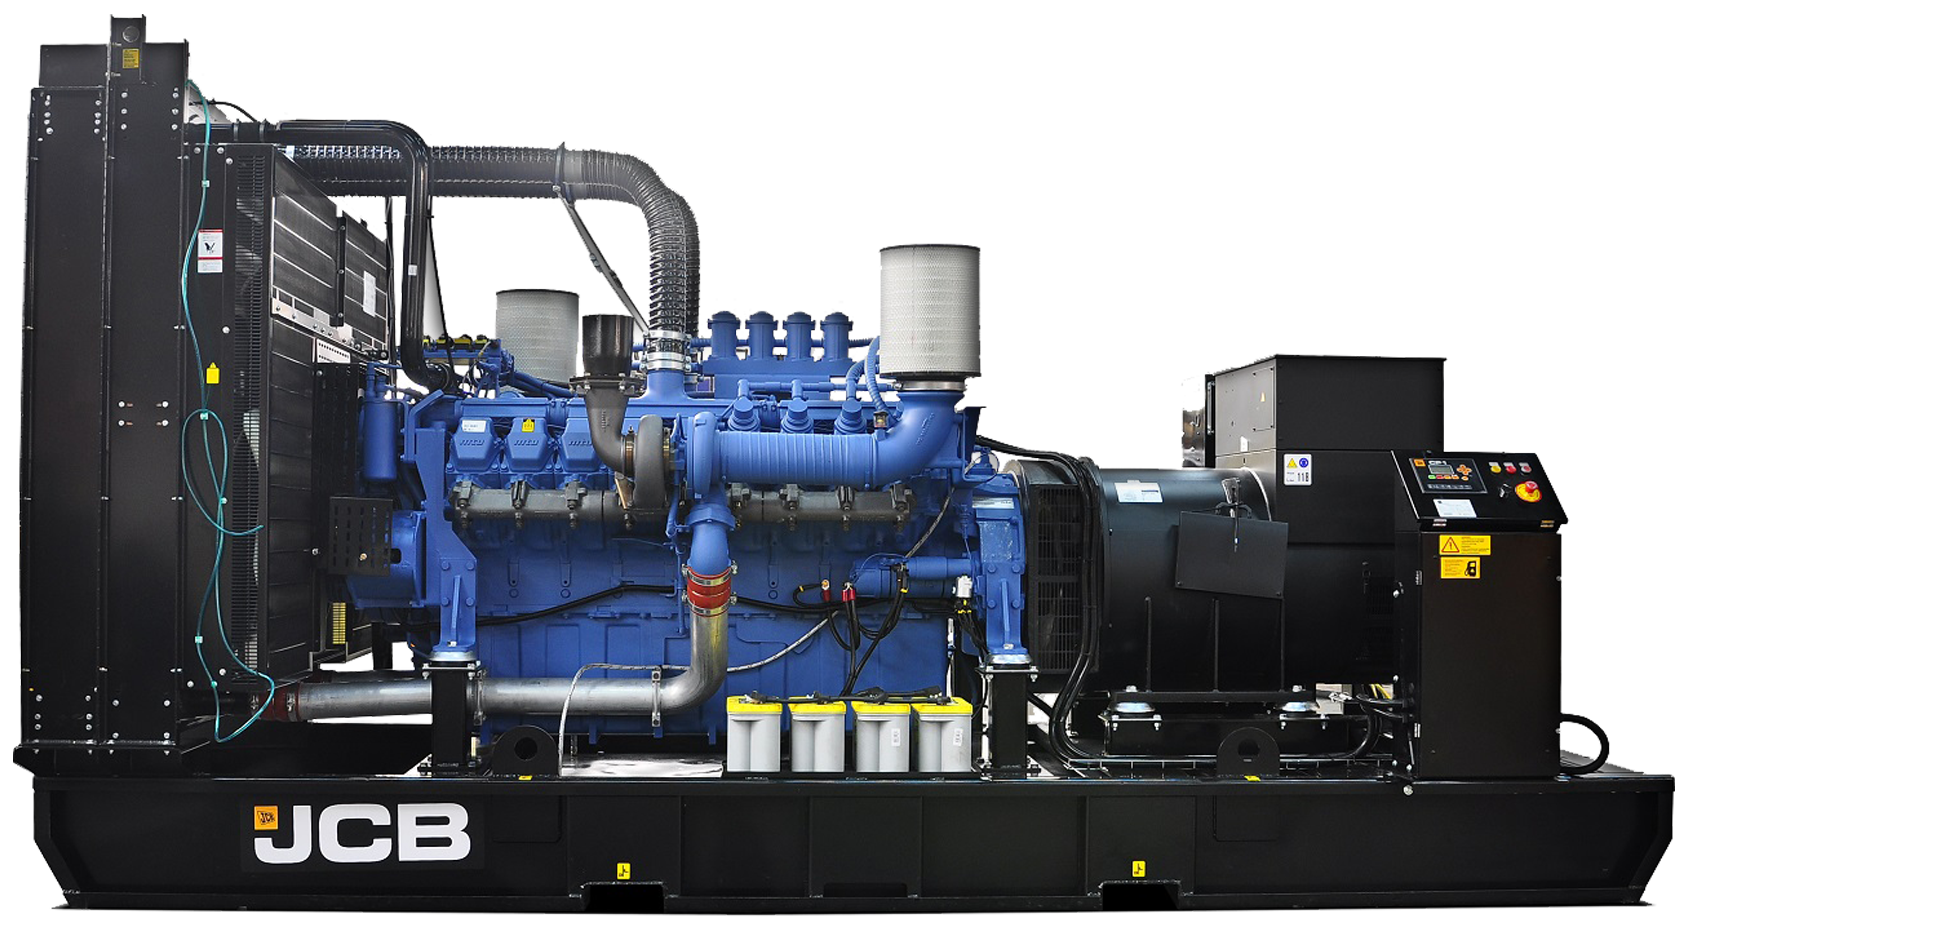 Nødstrømsanlæg hos Norwerk JCB G975X